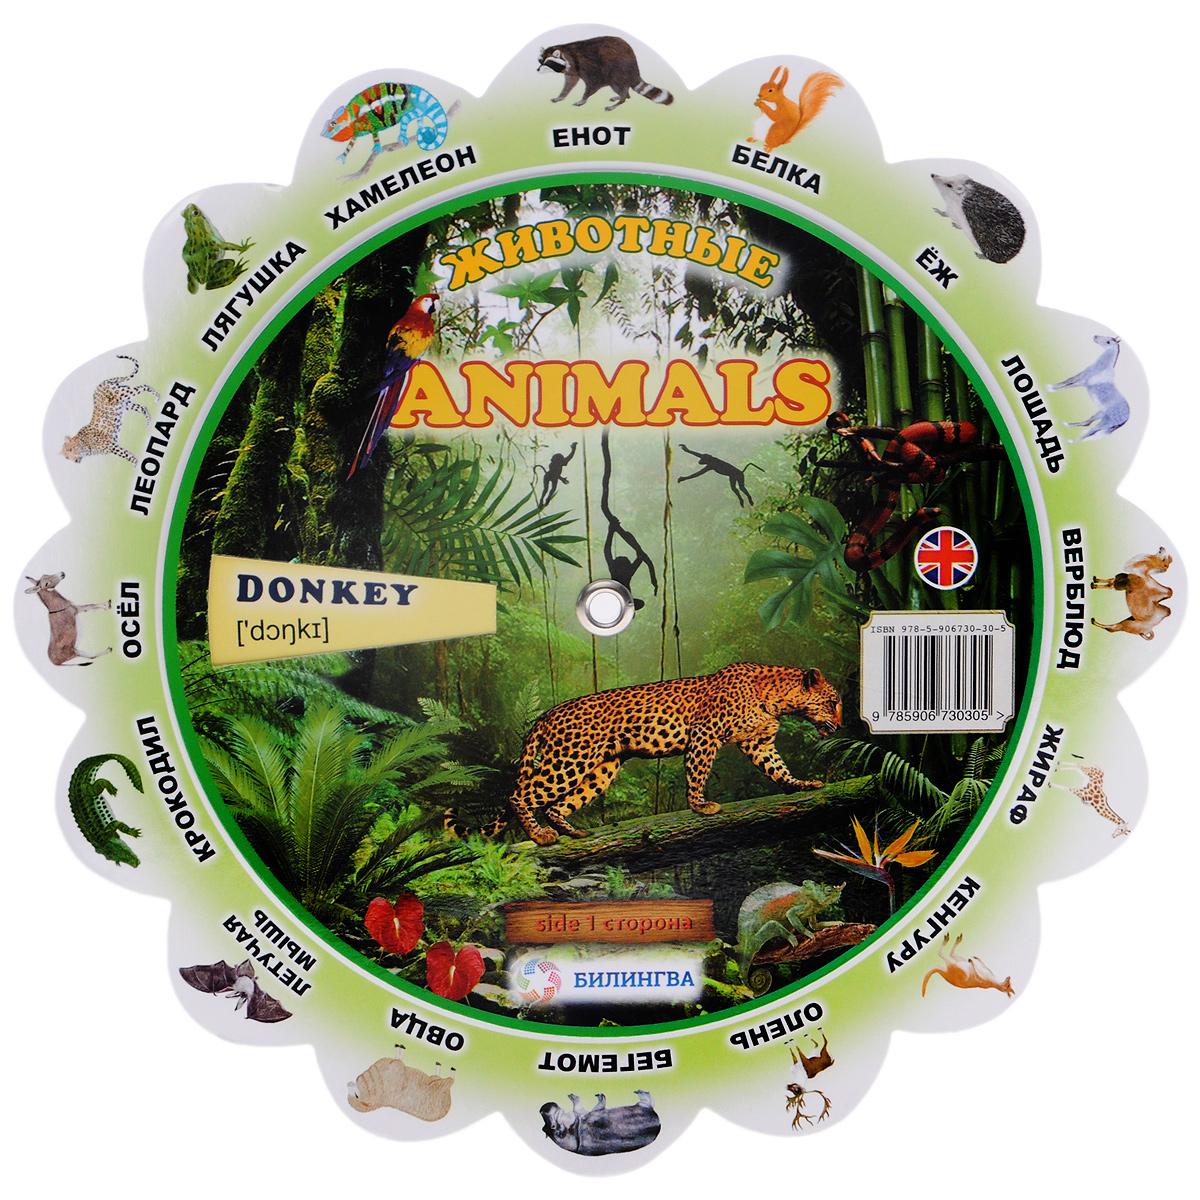 Animals / ��������. ���������������� ������������ �������